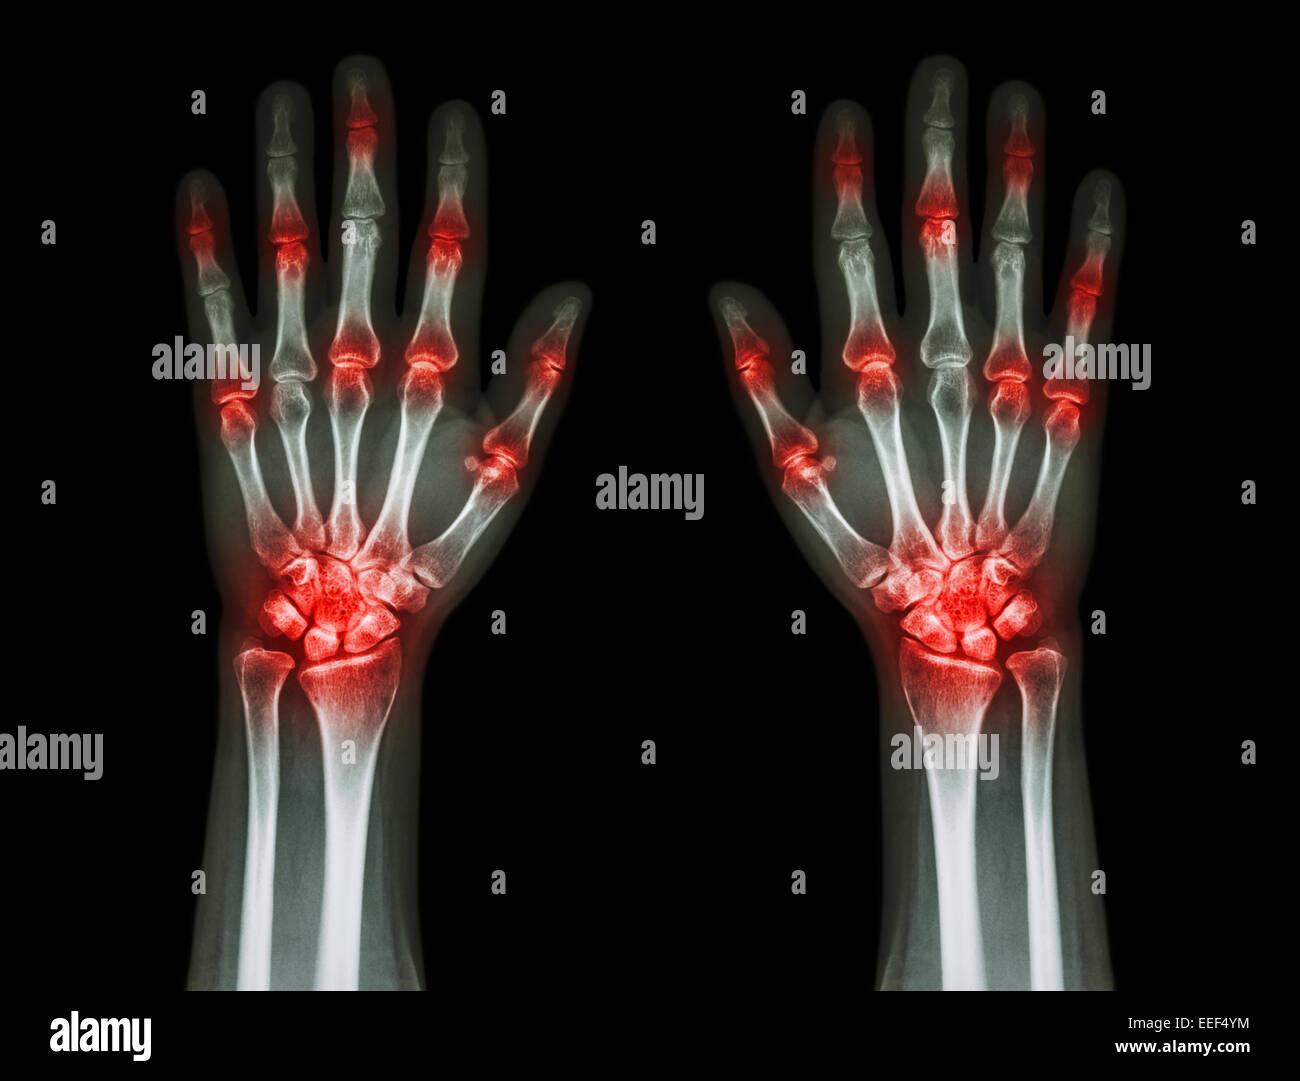 multiple joint arthritis both hands ( Gout , Rheumatoid ) on black background - Stock Image